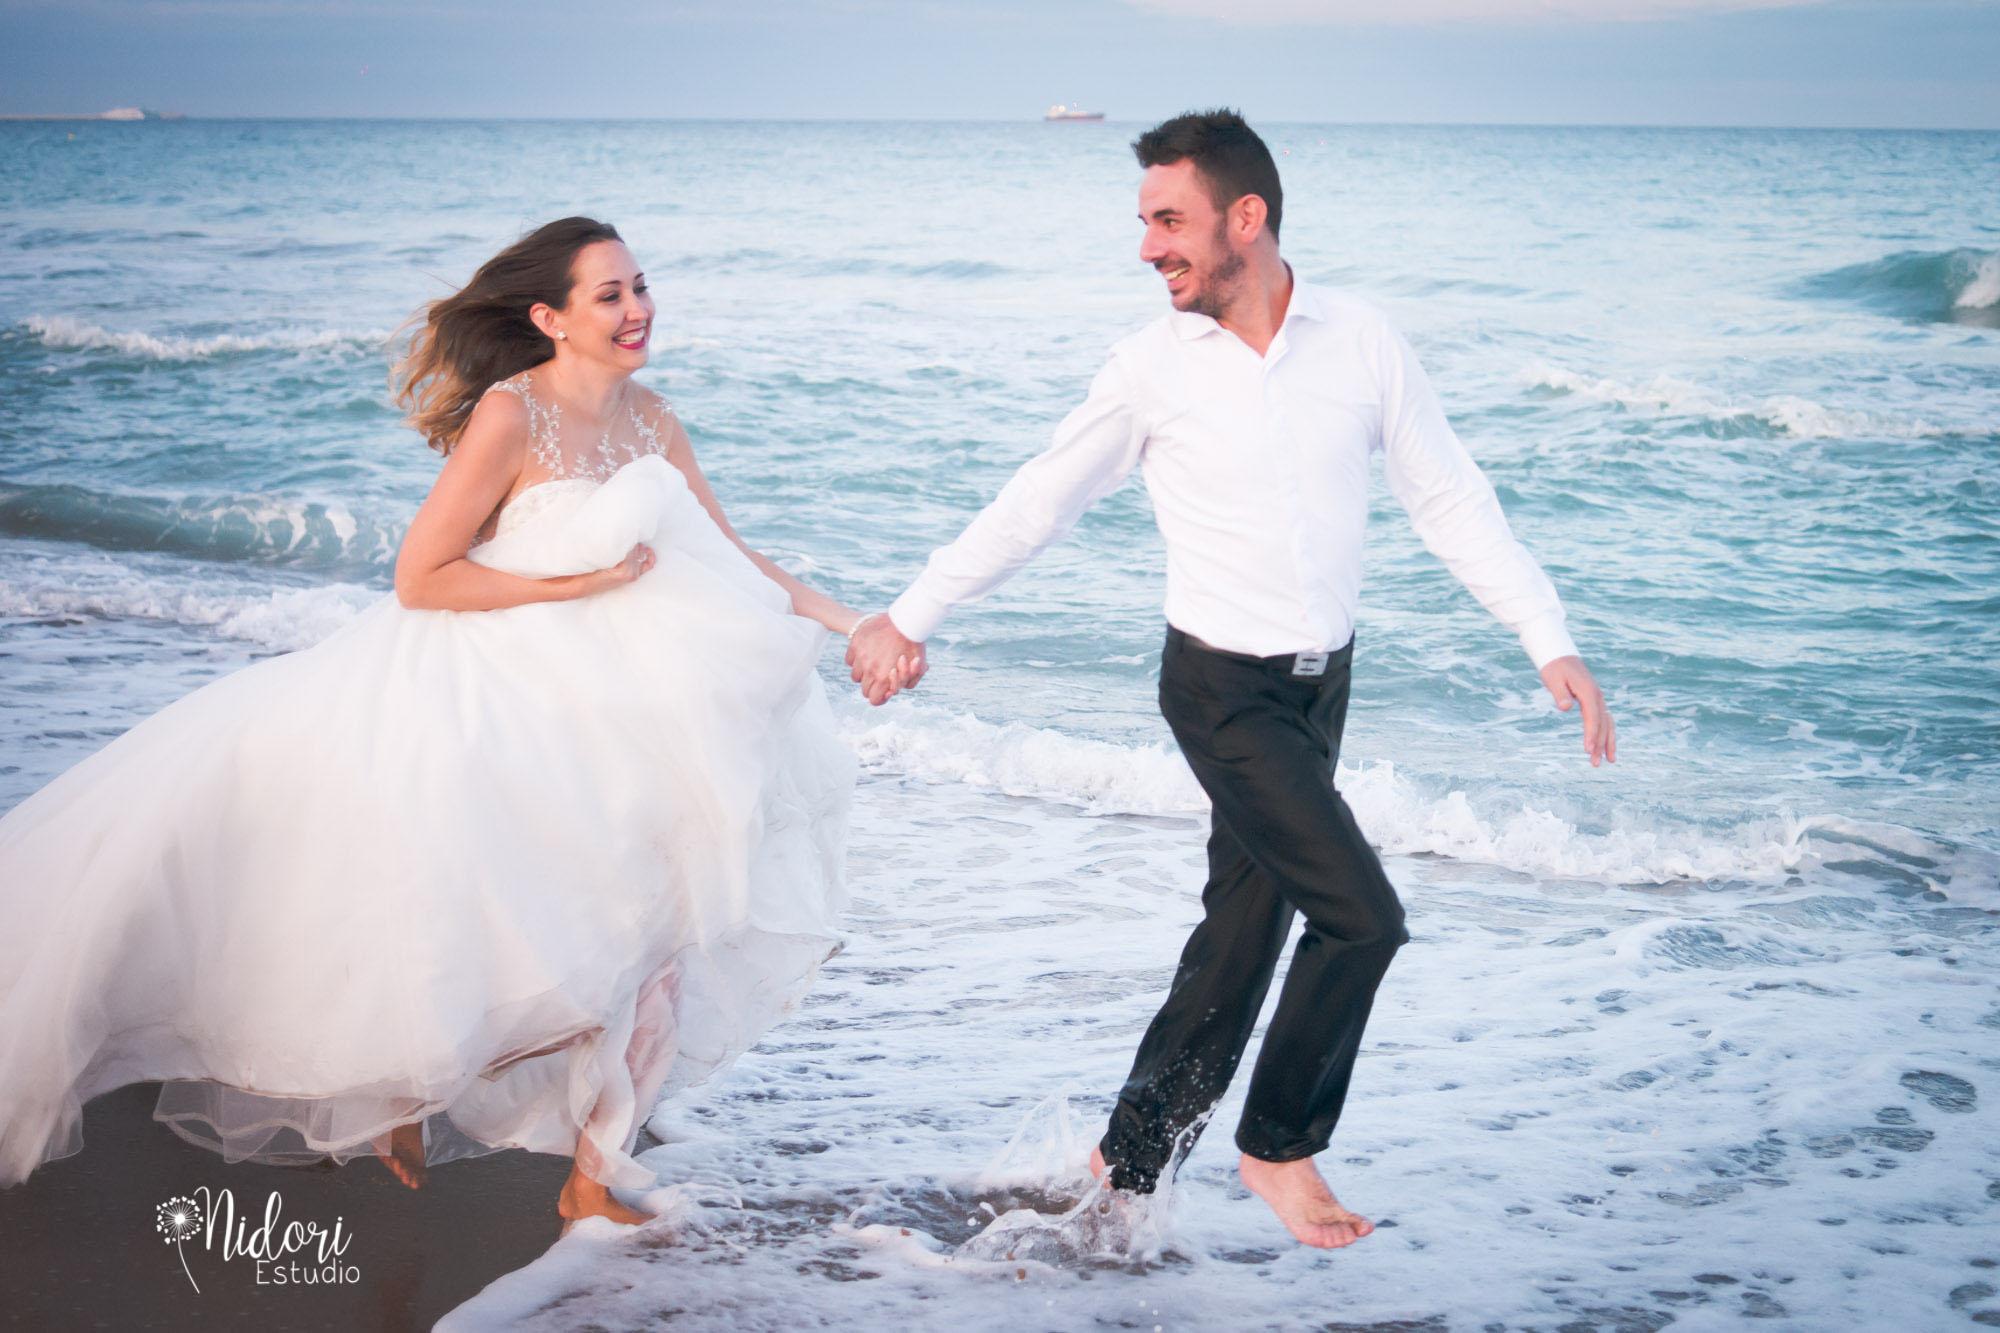 fotos-de-boda-reportaje-novios-fotografia-boda-nidoriestudio-fotos-valencia-almazora-castellon-españa-spain-024